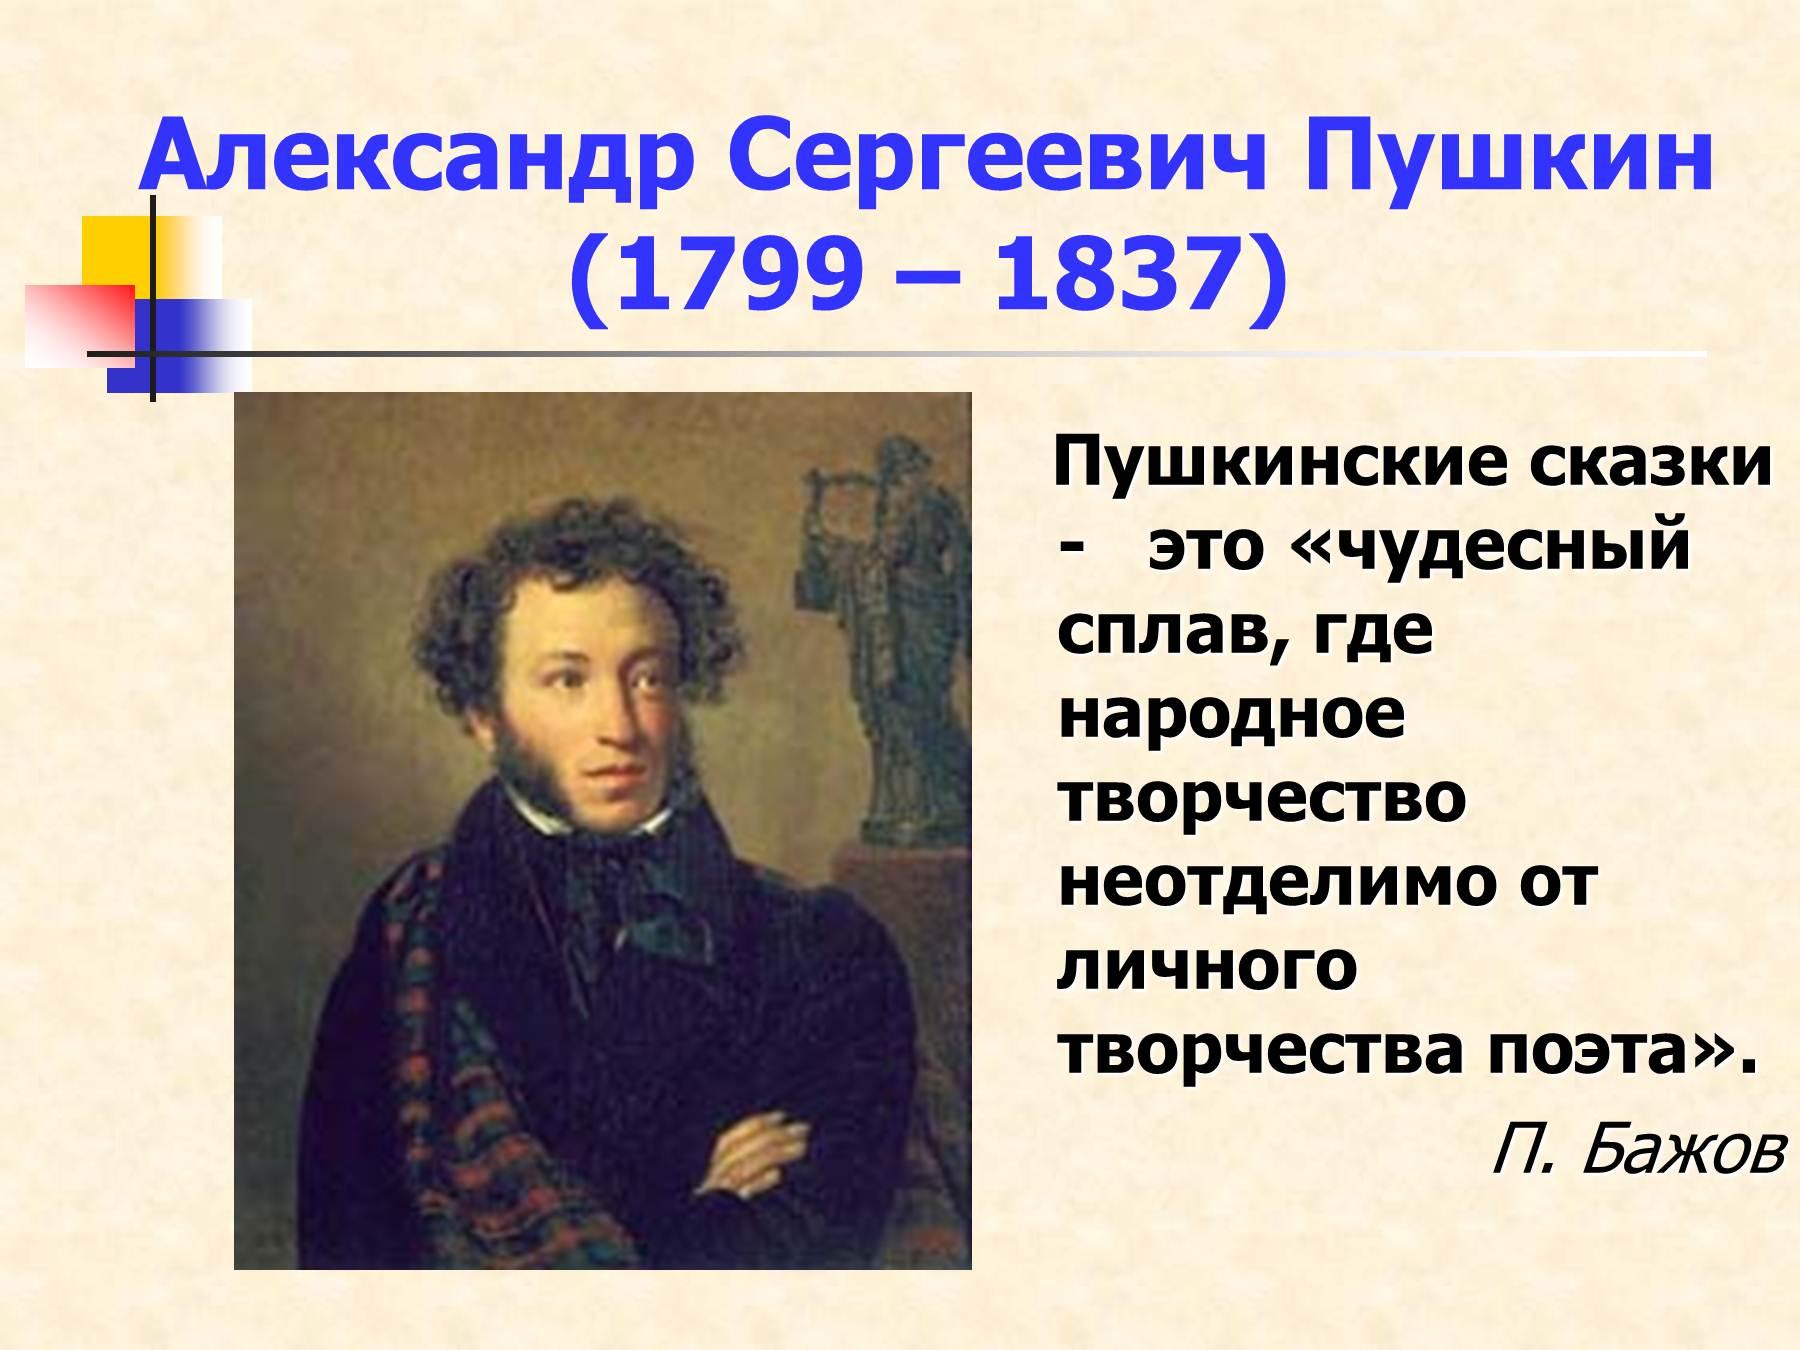 Чэчэклэр абсалямов, презентация о мертвой царевне по сказок пушкина сочинение лекции